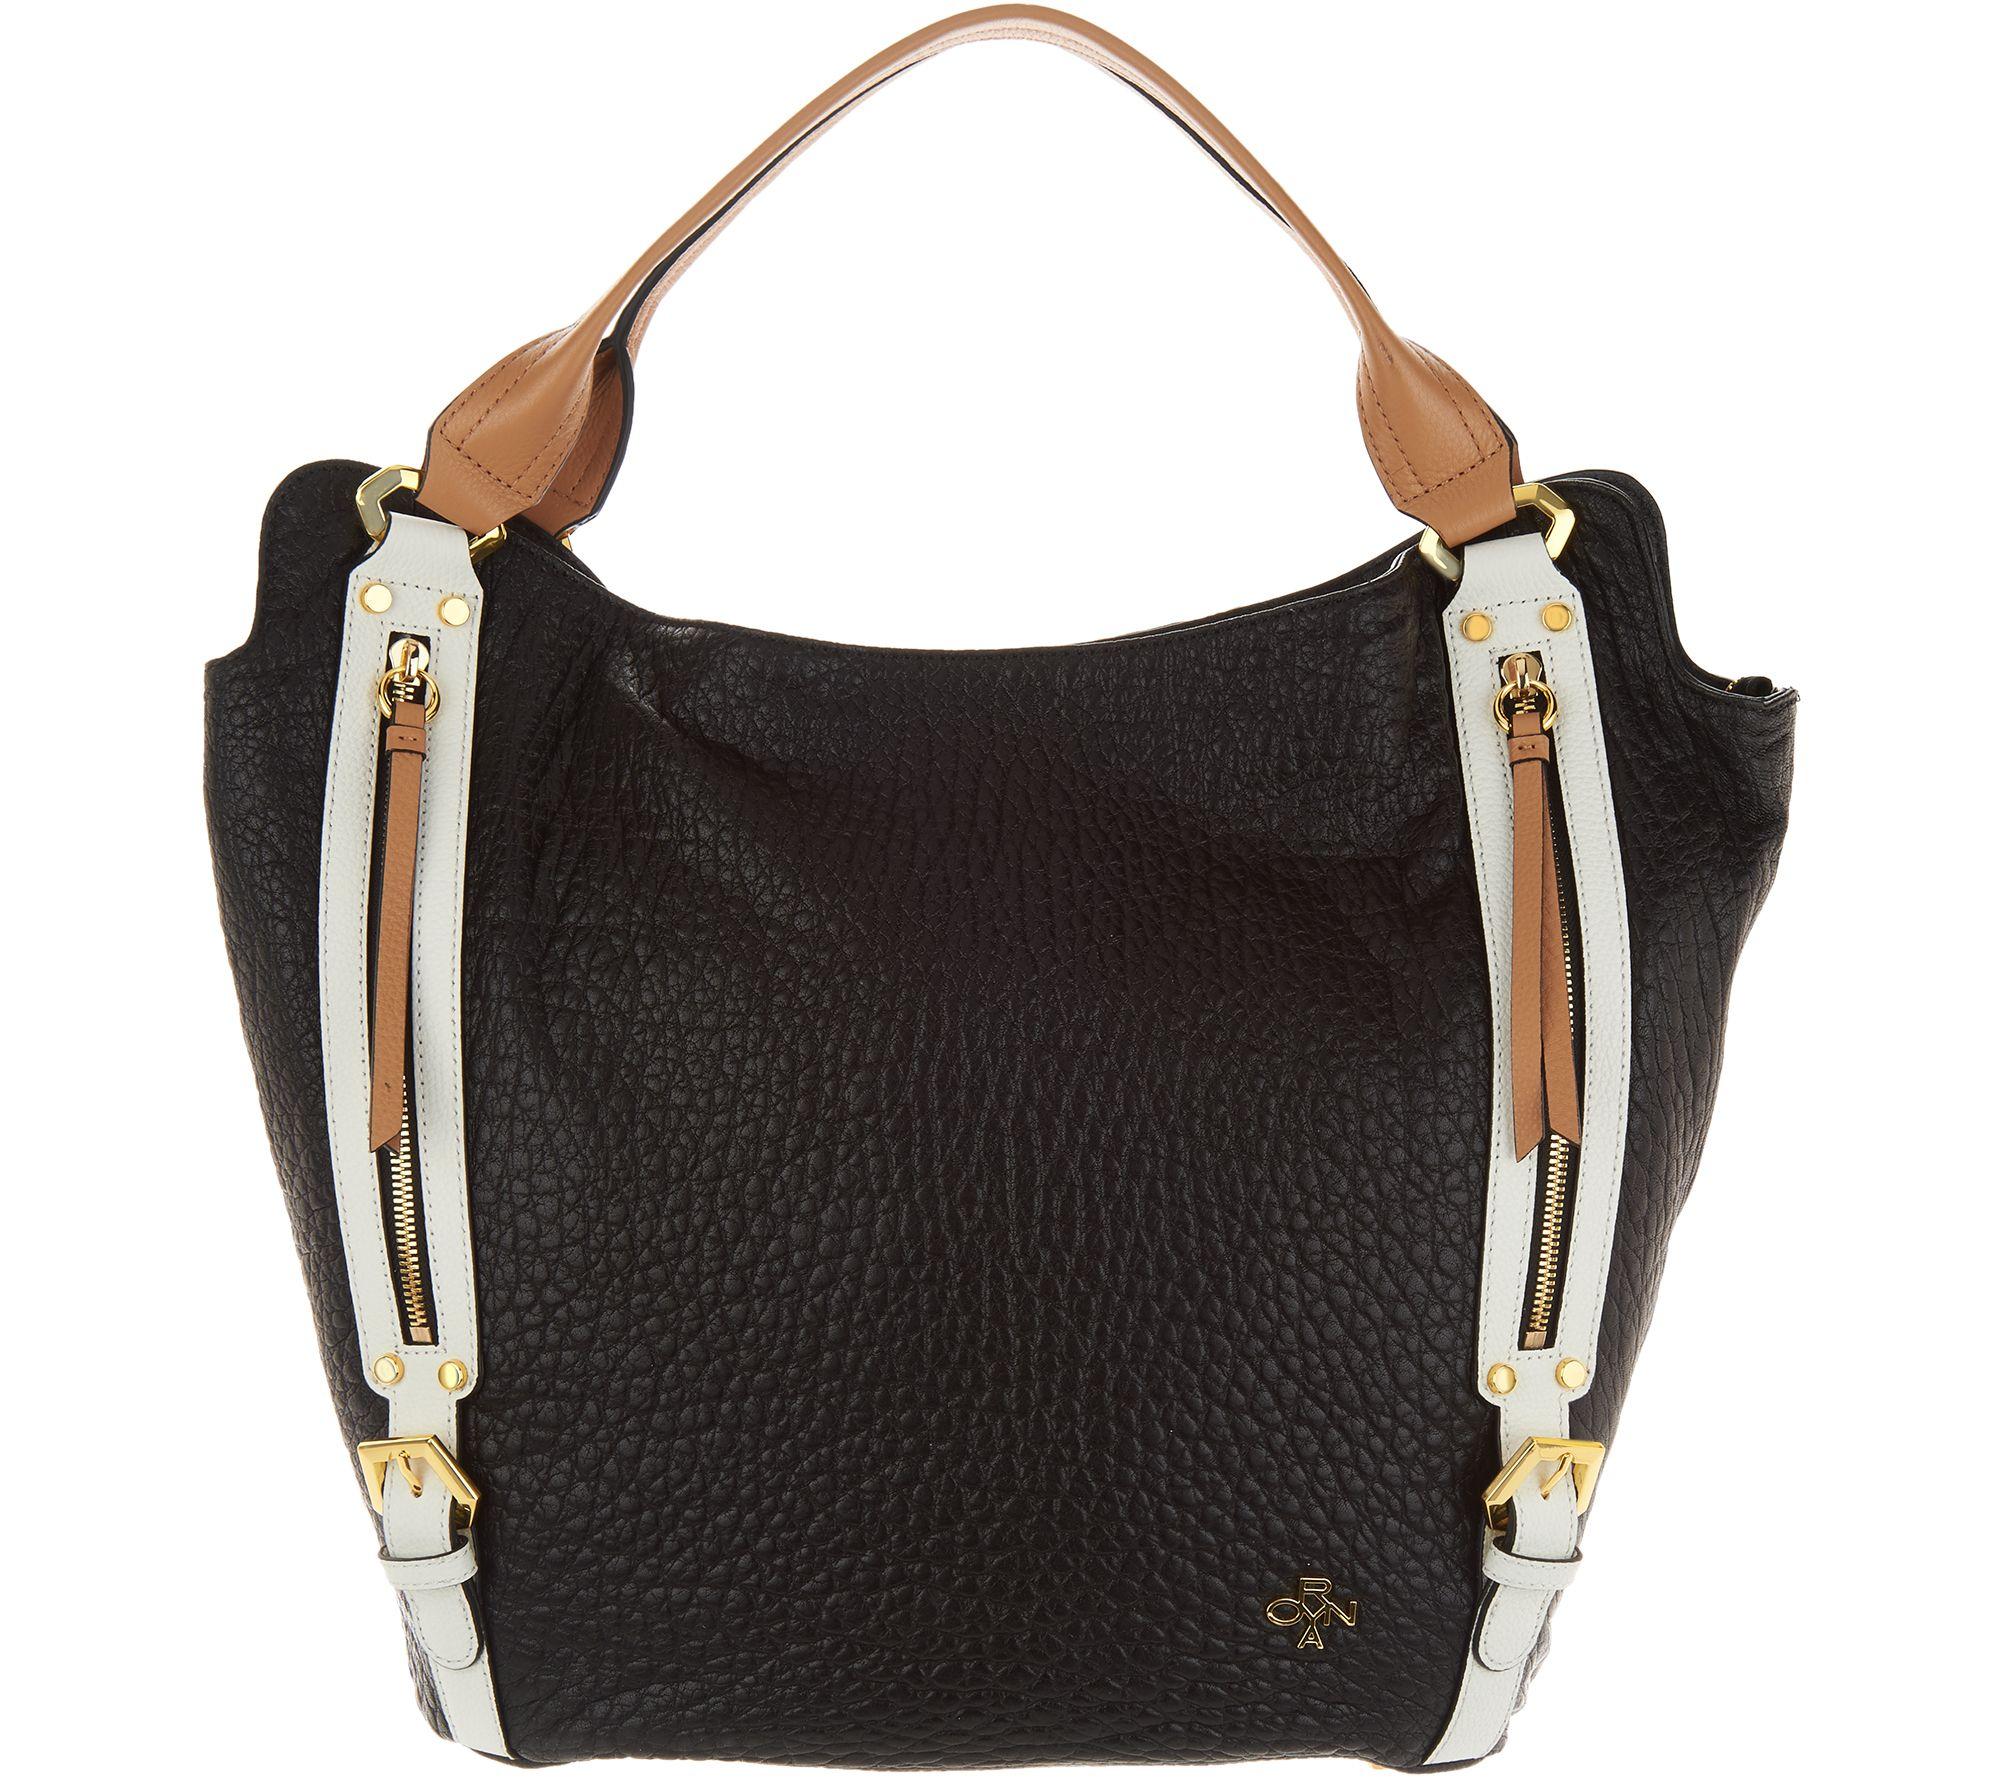 648b8186eda9 orYANY Lamb Leather Tote Handbag -Lauren - Page 1 — QVC.com